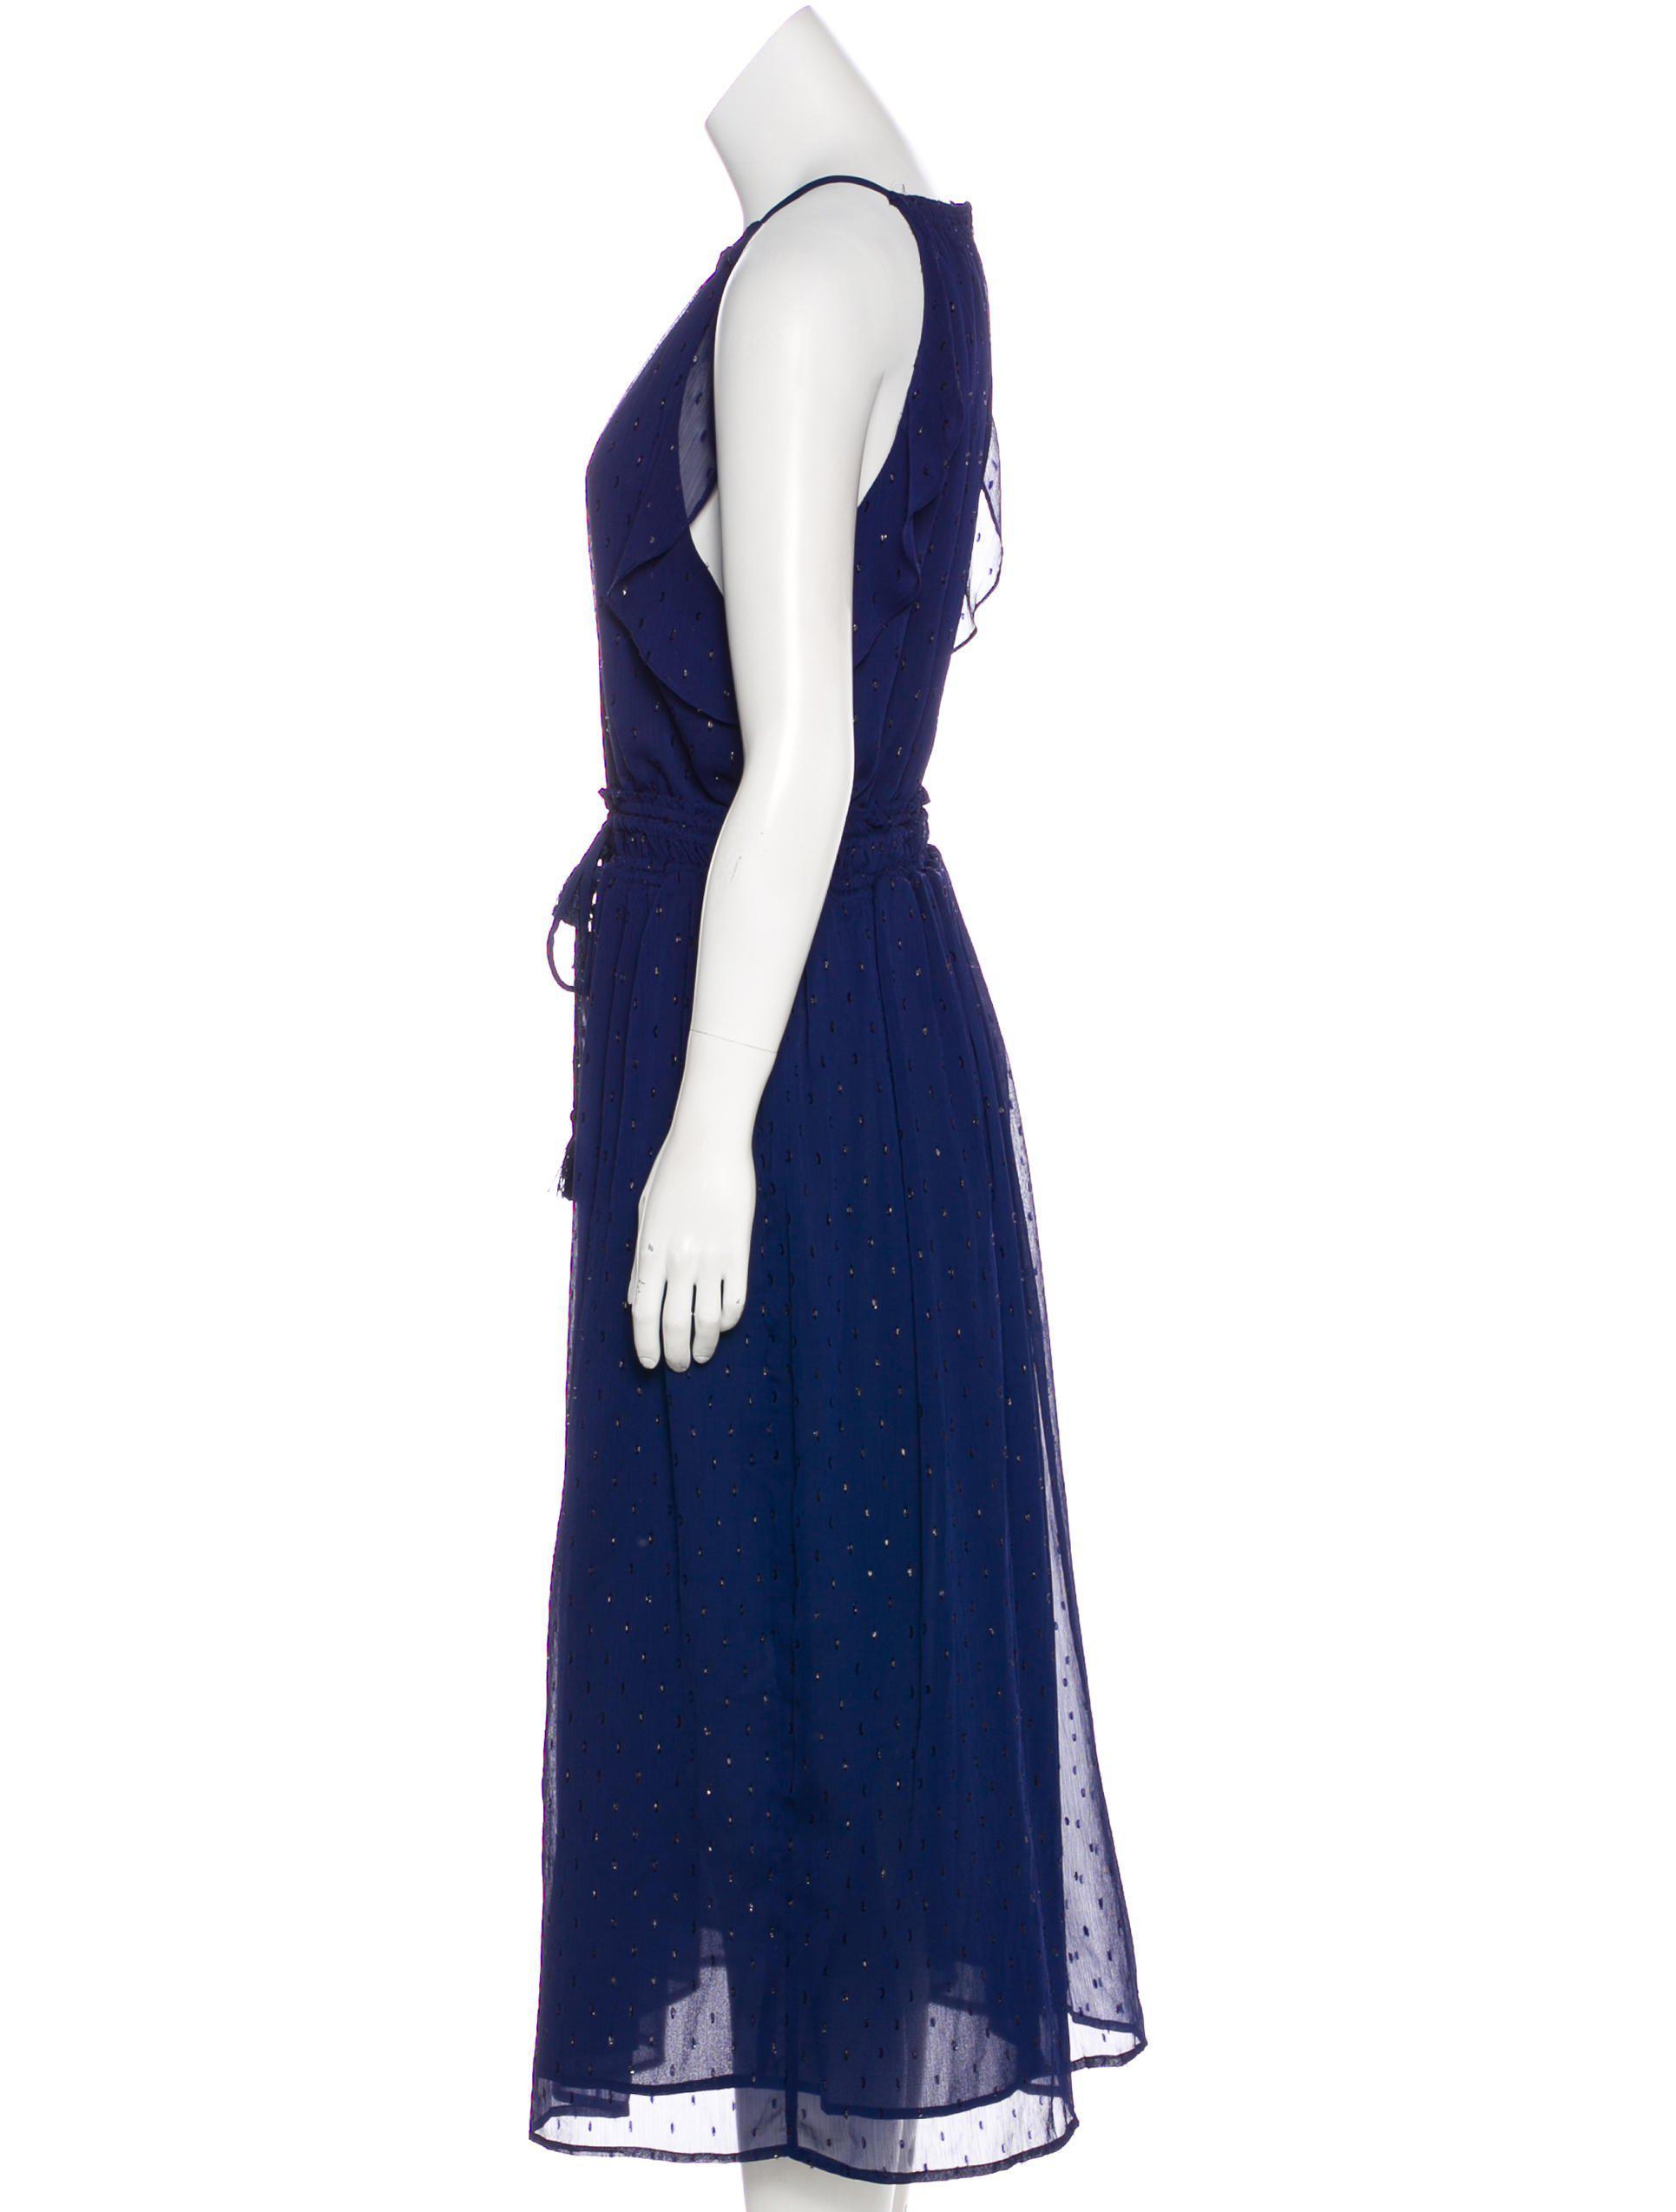 Lyst - Michael Michael Kors Michael Kors Devoré Evening Dress in Blue